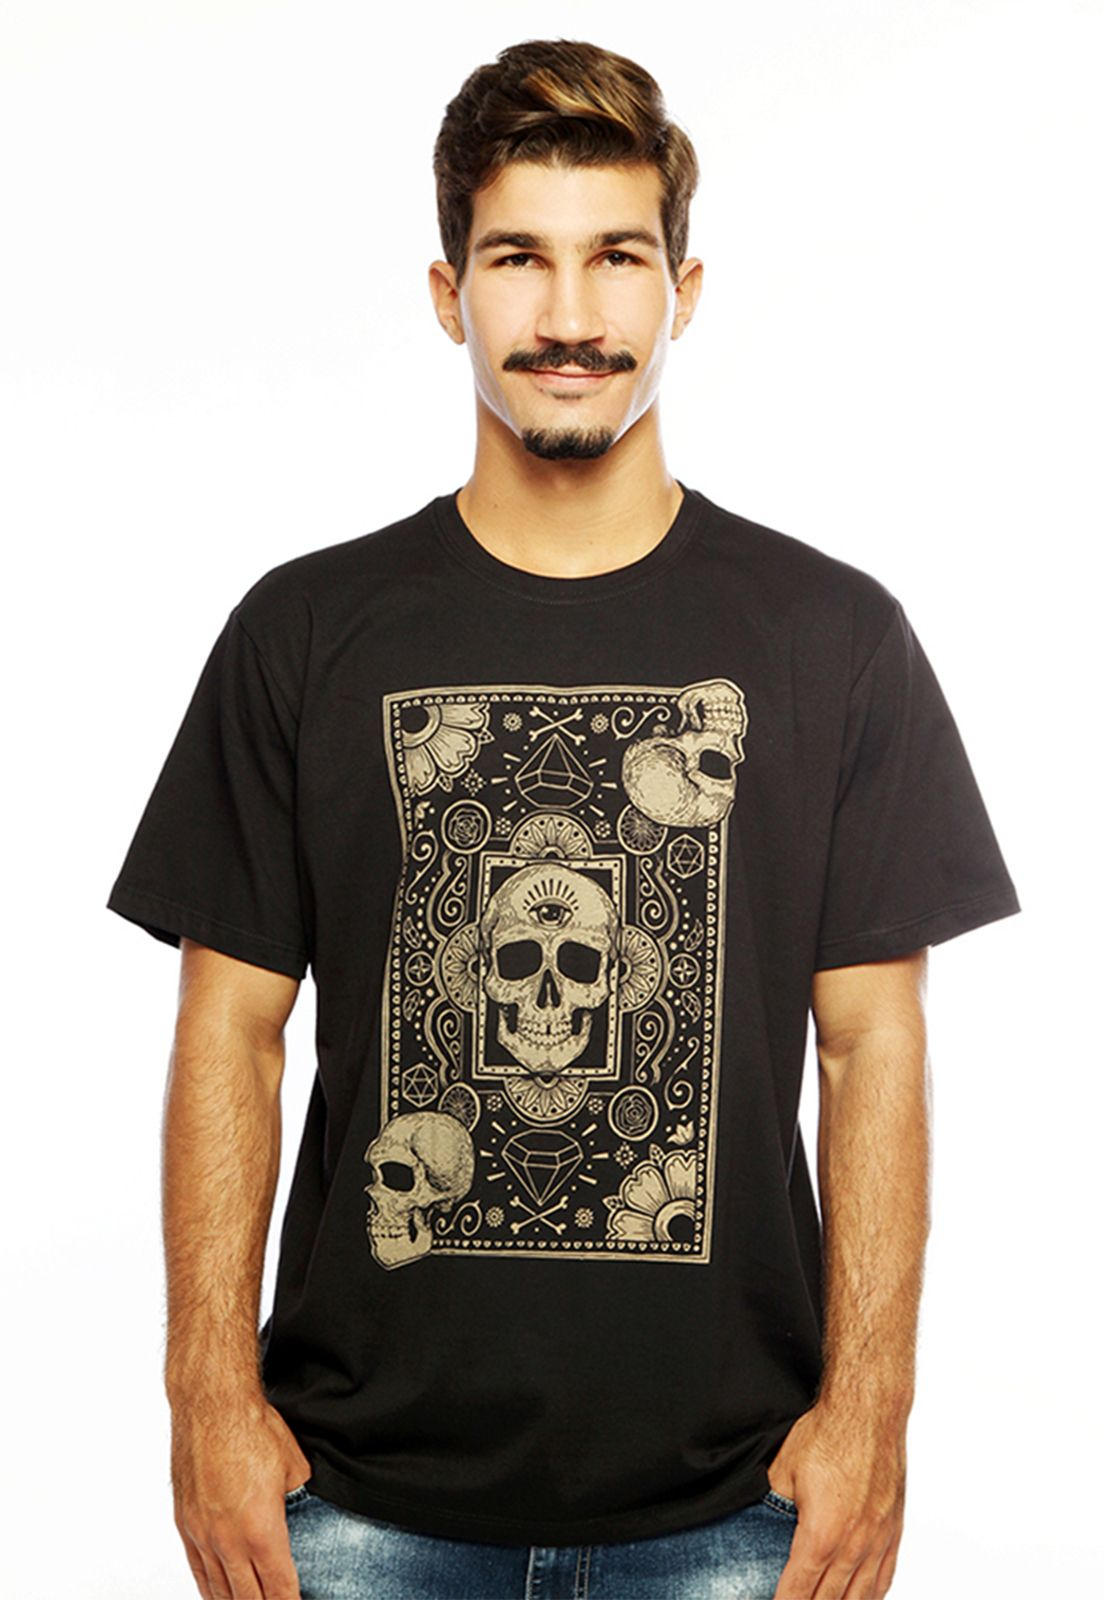 Camiseta masculina preta Cards of Skull - 100% algodão - Hardivision